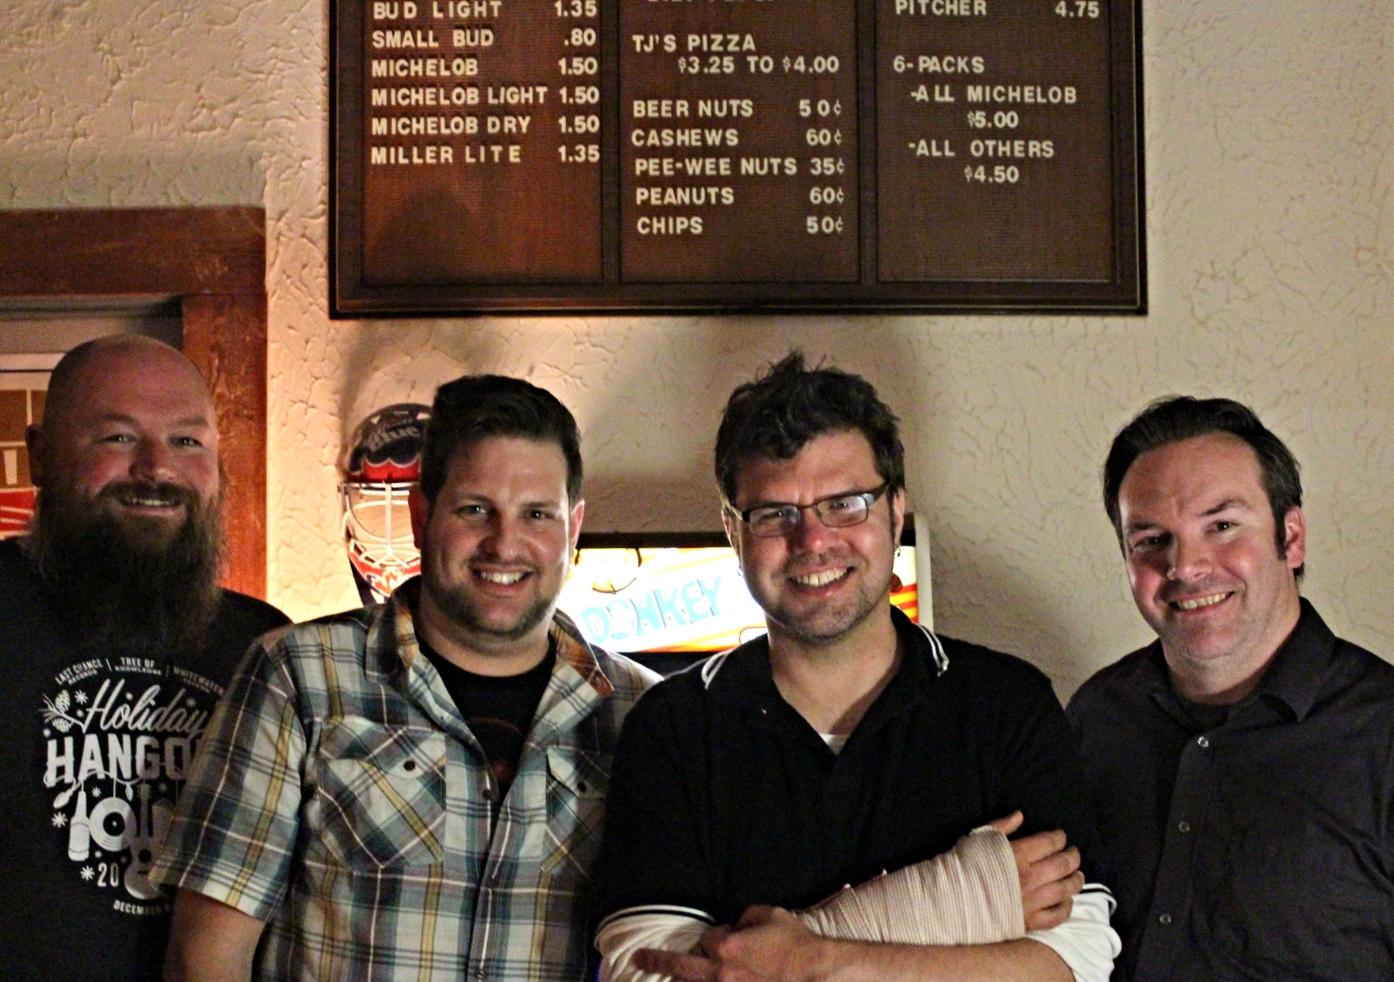 Bart, Jeff, Thomas Crone, and Scott